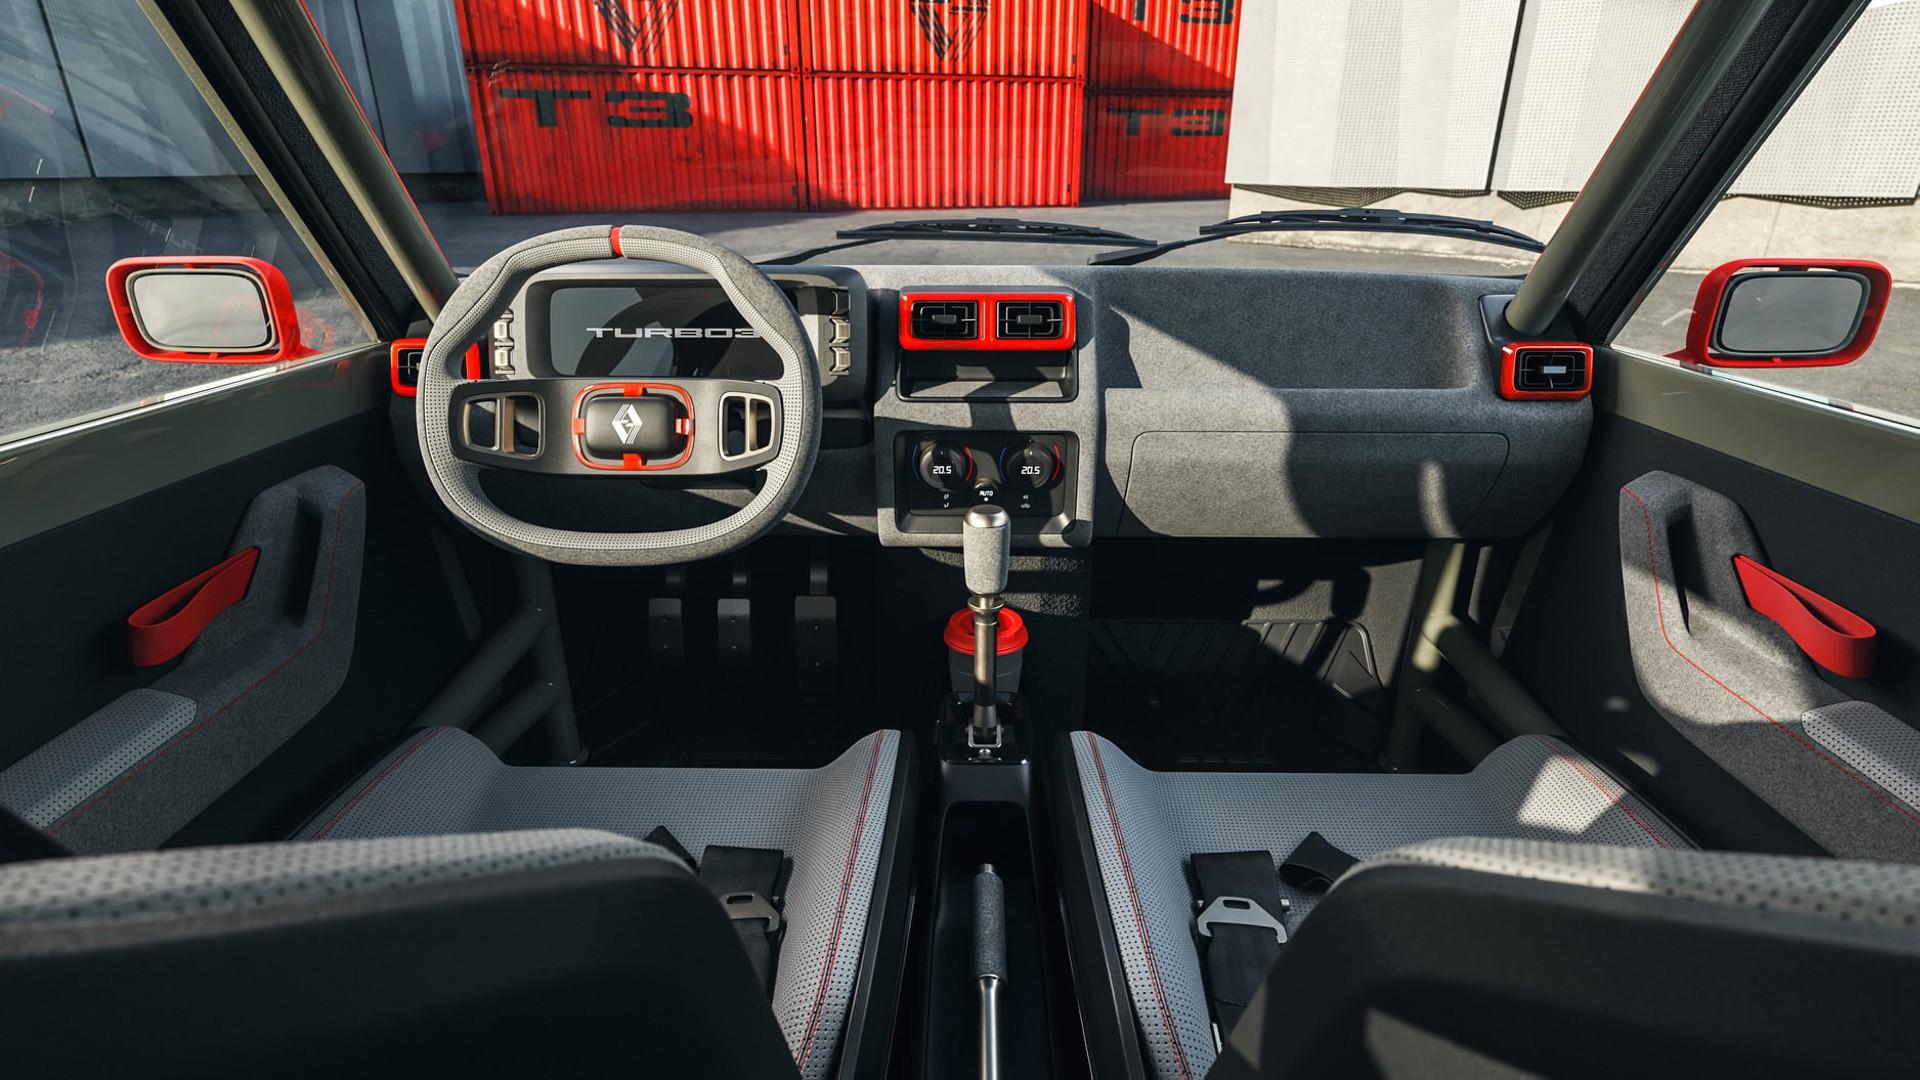 Renault-5_Turbo_3-0001